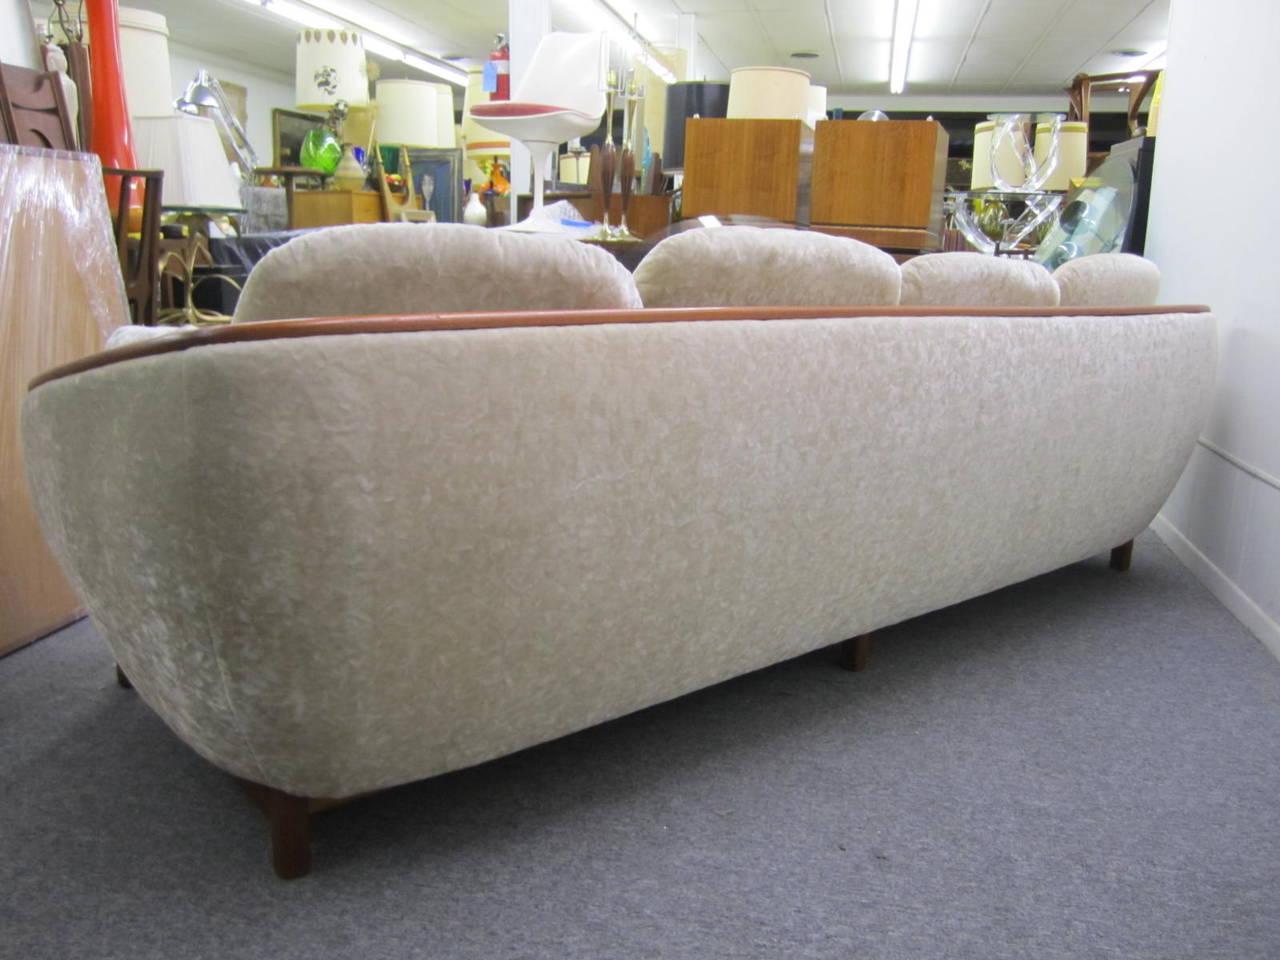 Canadian Dazzling R. Huber Curved Back Teak Sofa, Mid-Century Danish Modern For Sale